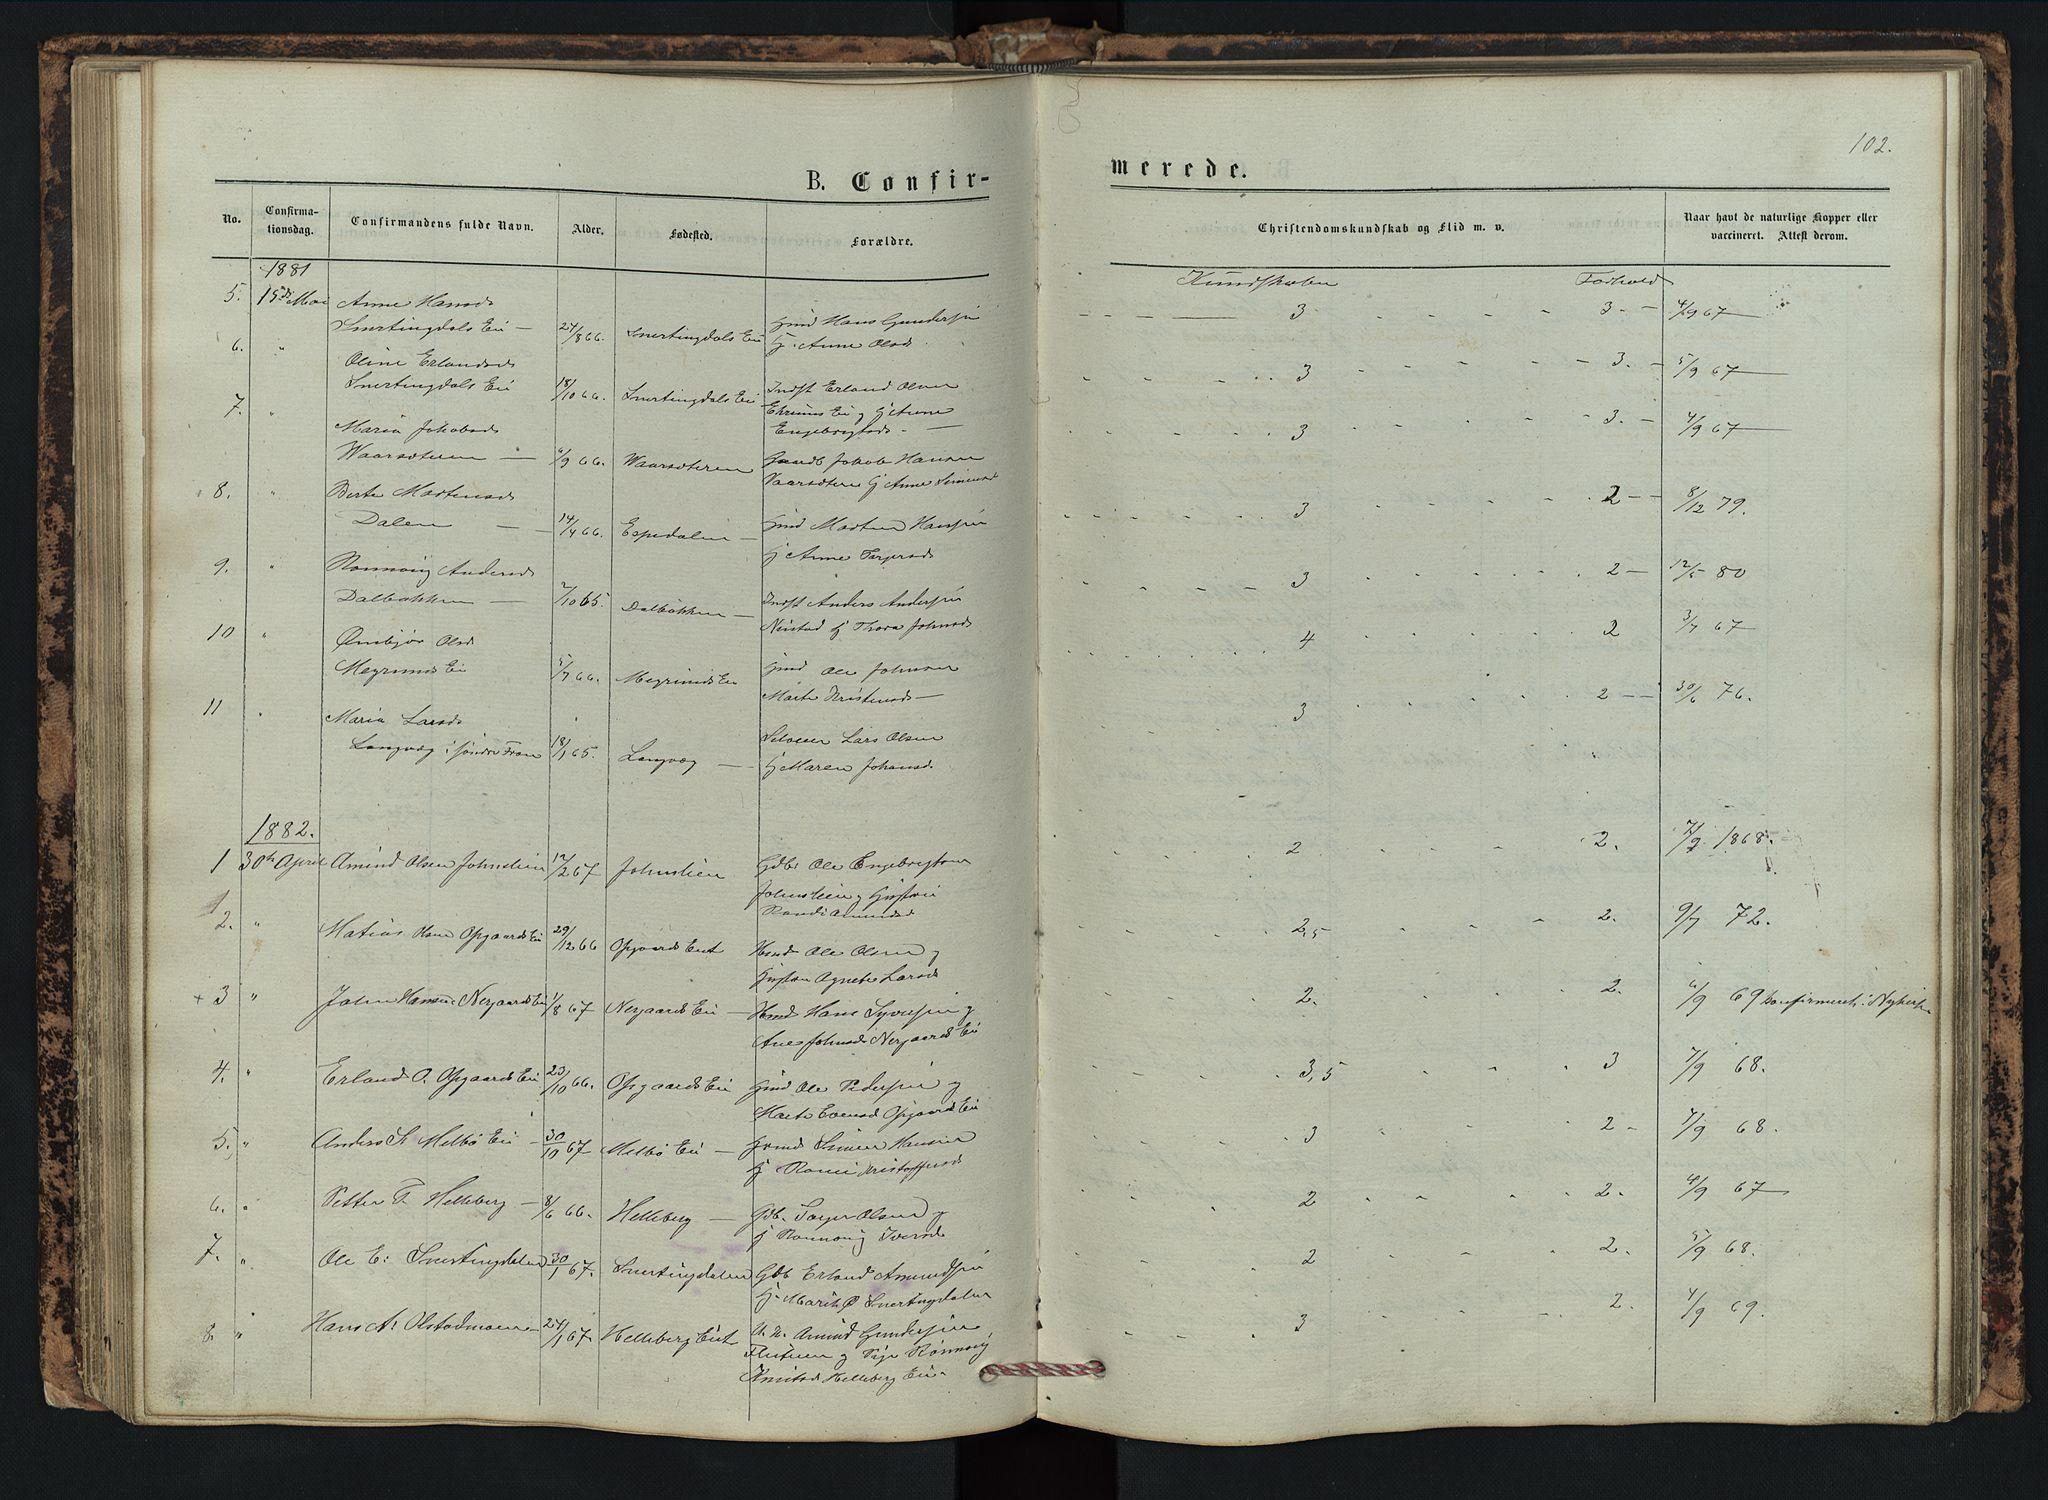 SAH, Vestre Gausdal prestekontor, Klokkerbok nr. 2, 1874-1897, s. 102